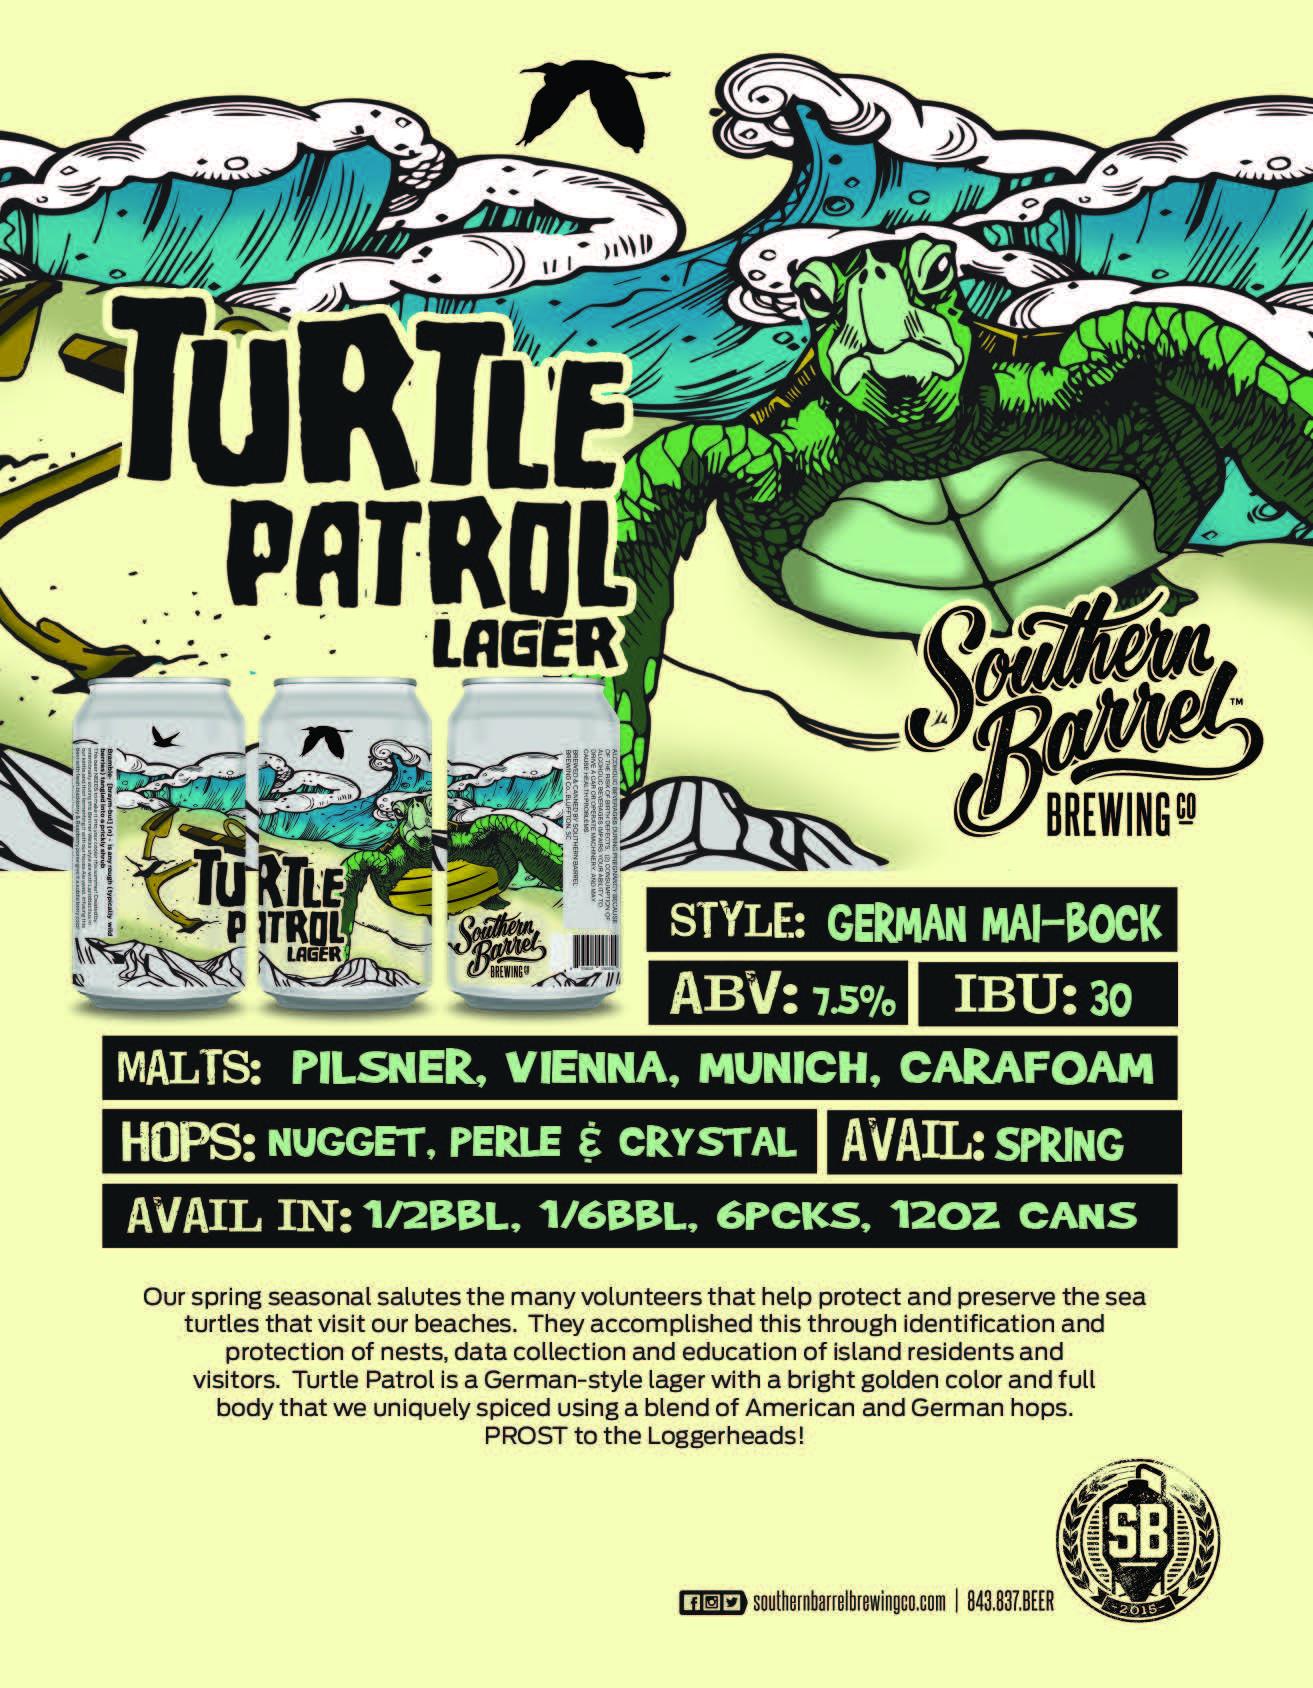 turtlepatrol_SS_2018.jpg